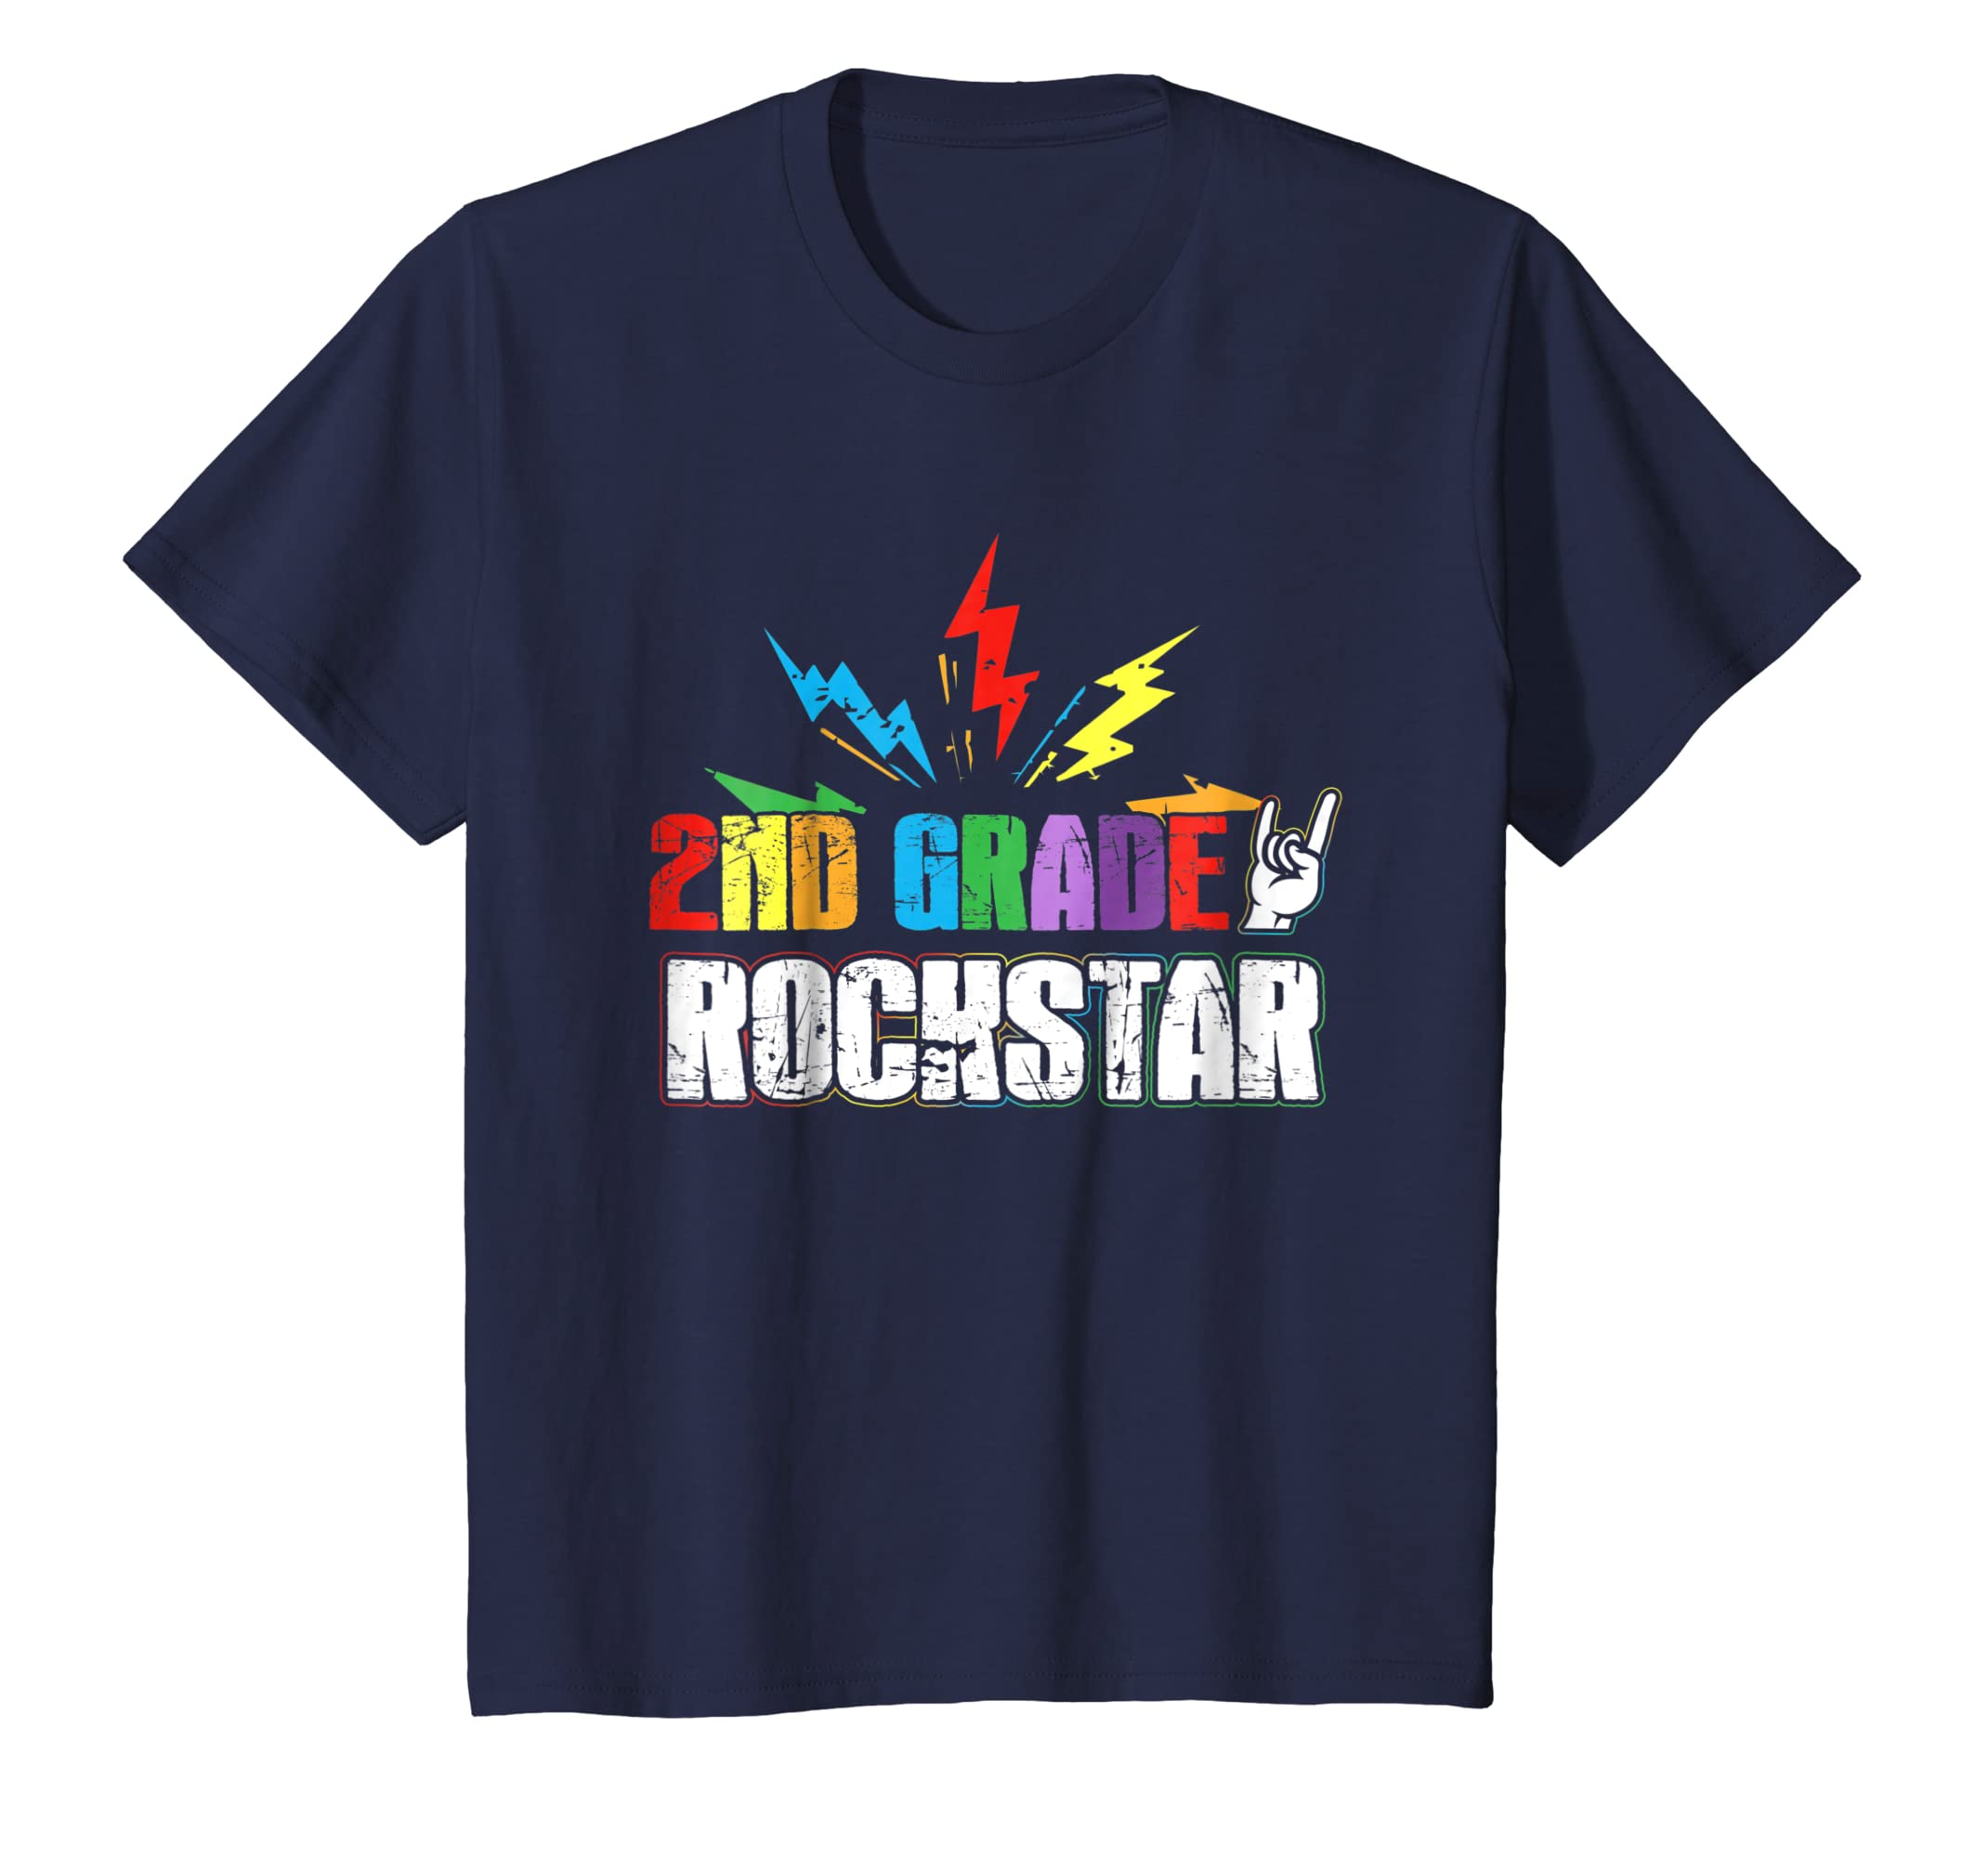 2nd Grade Rockstar Back To School 2018 T Shirt-Awarplus